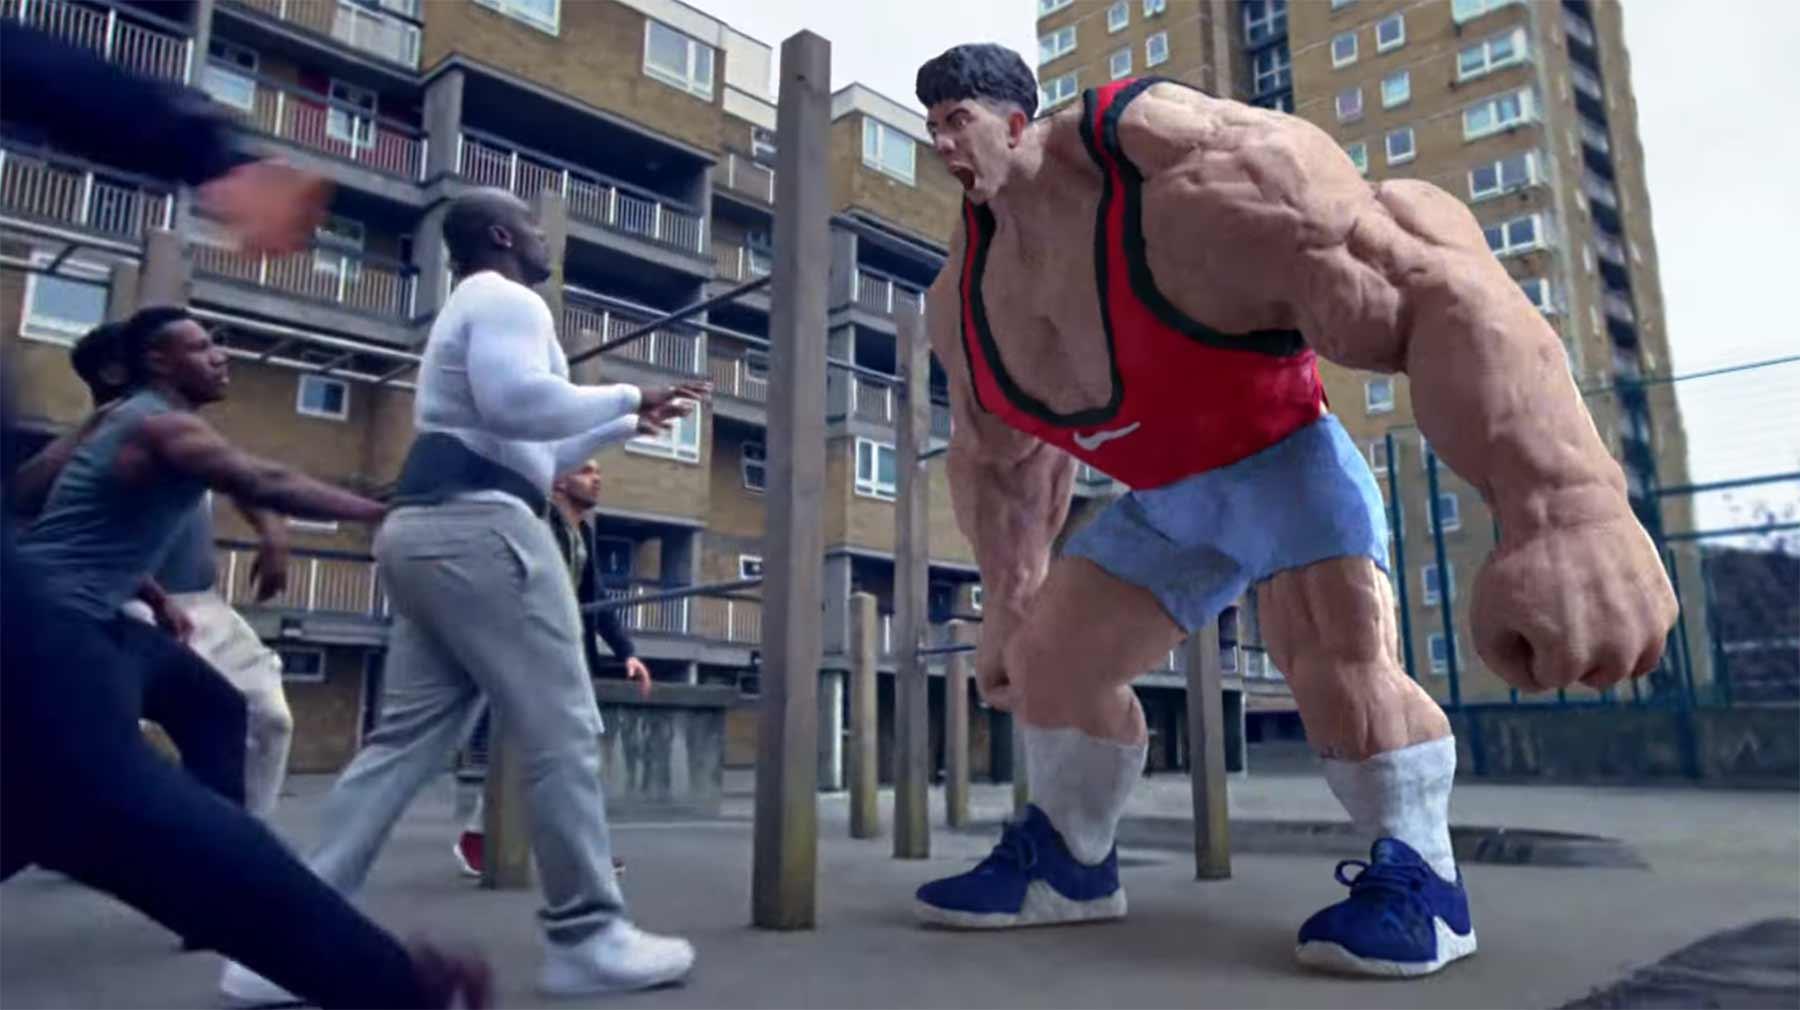 Nikes grandioser neuer sportübergreifender Spot nothing-beats-a-londoner-nike